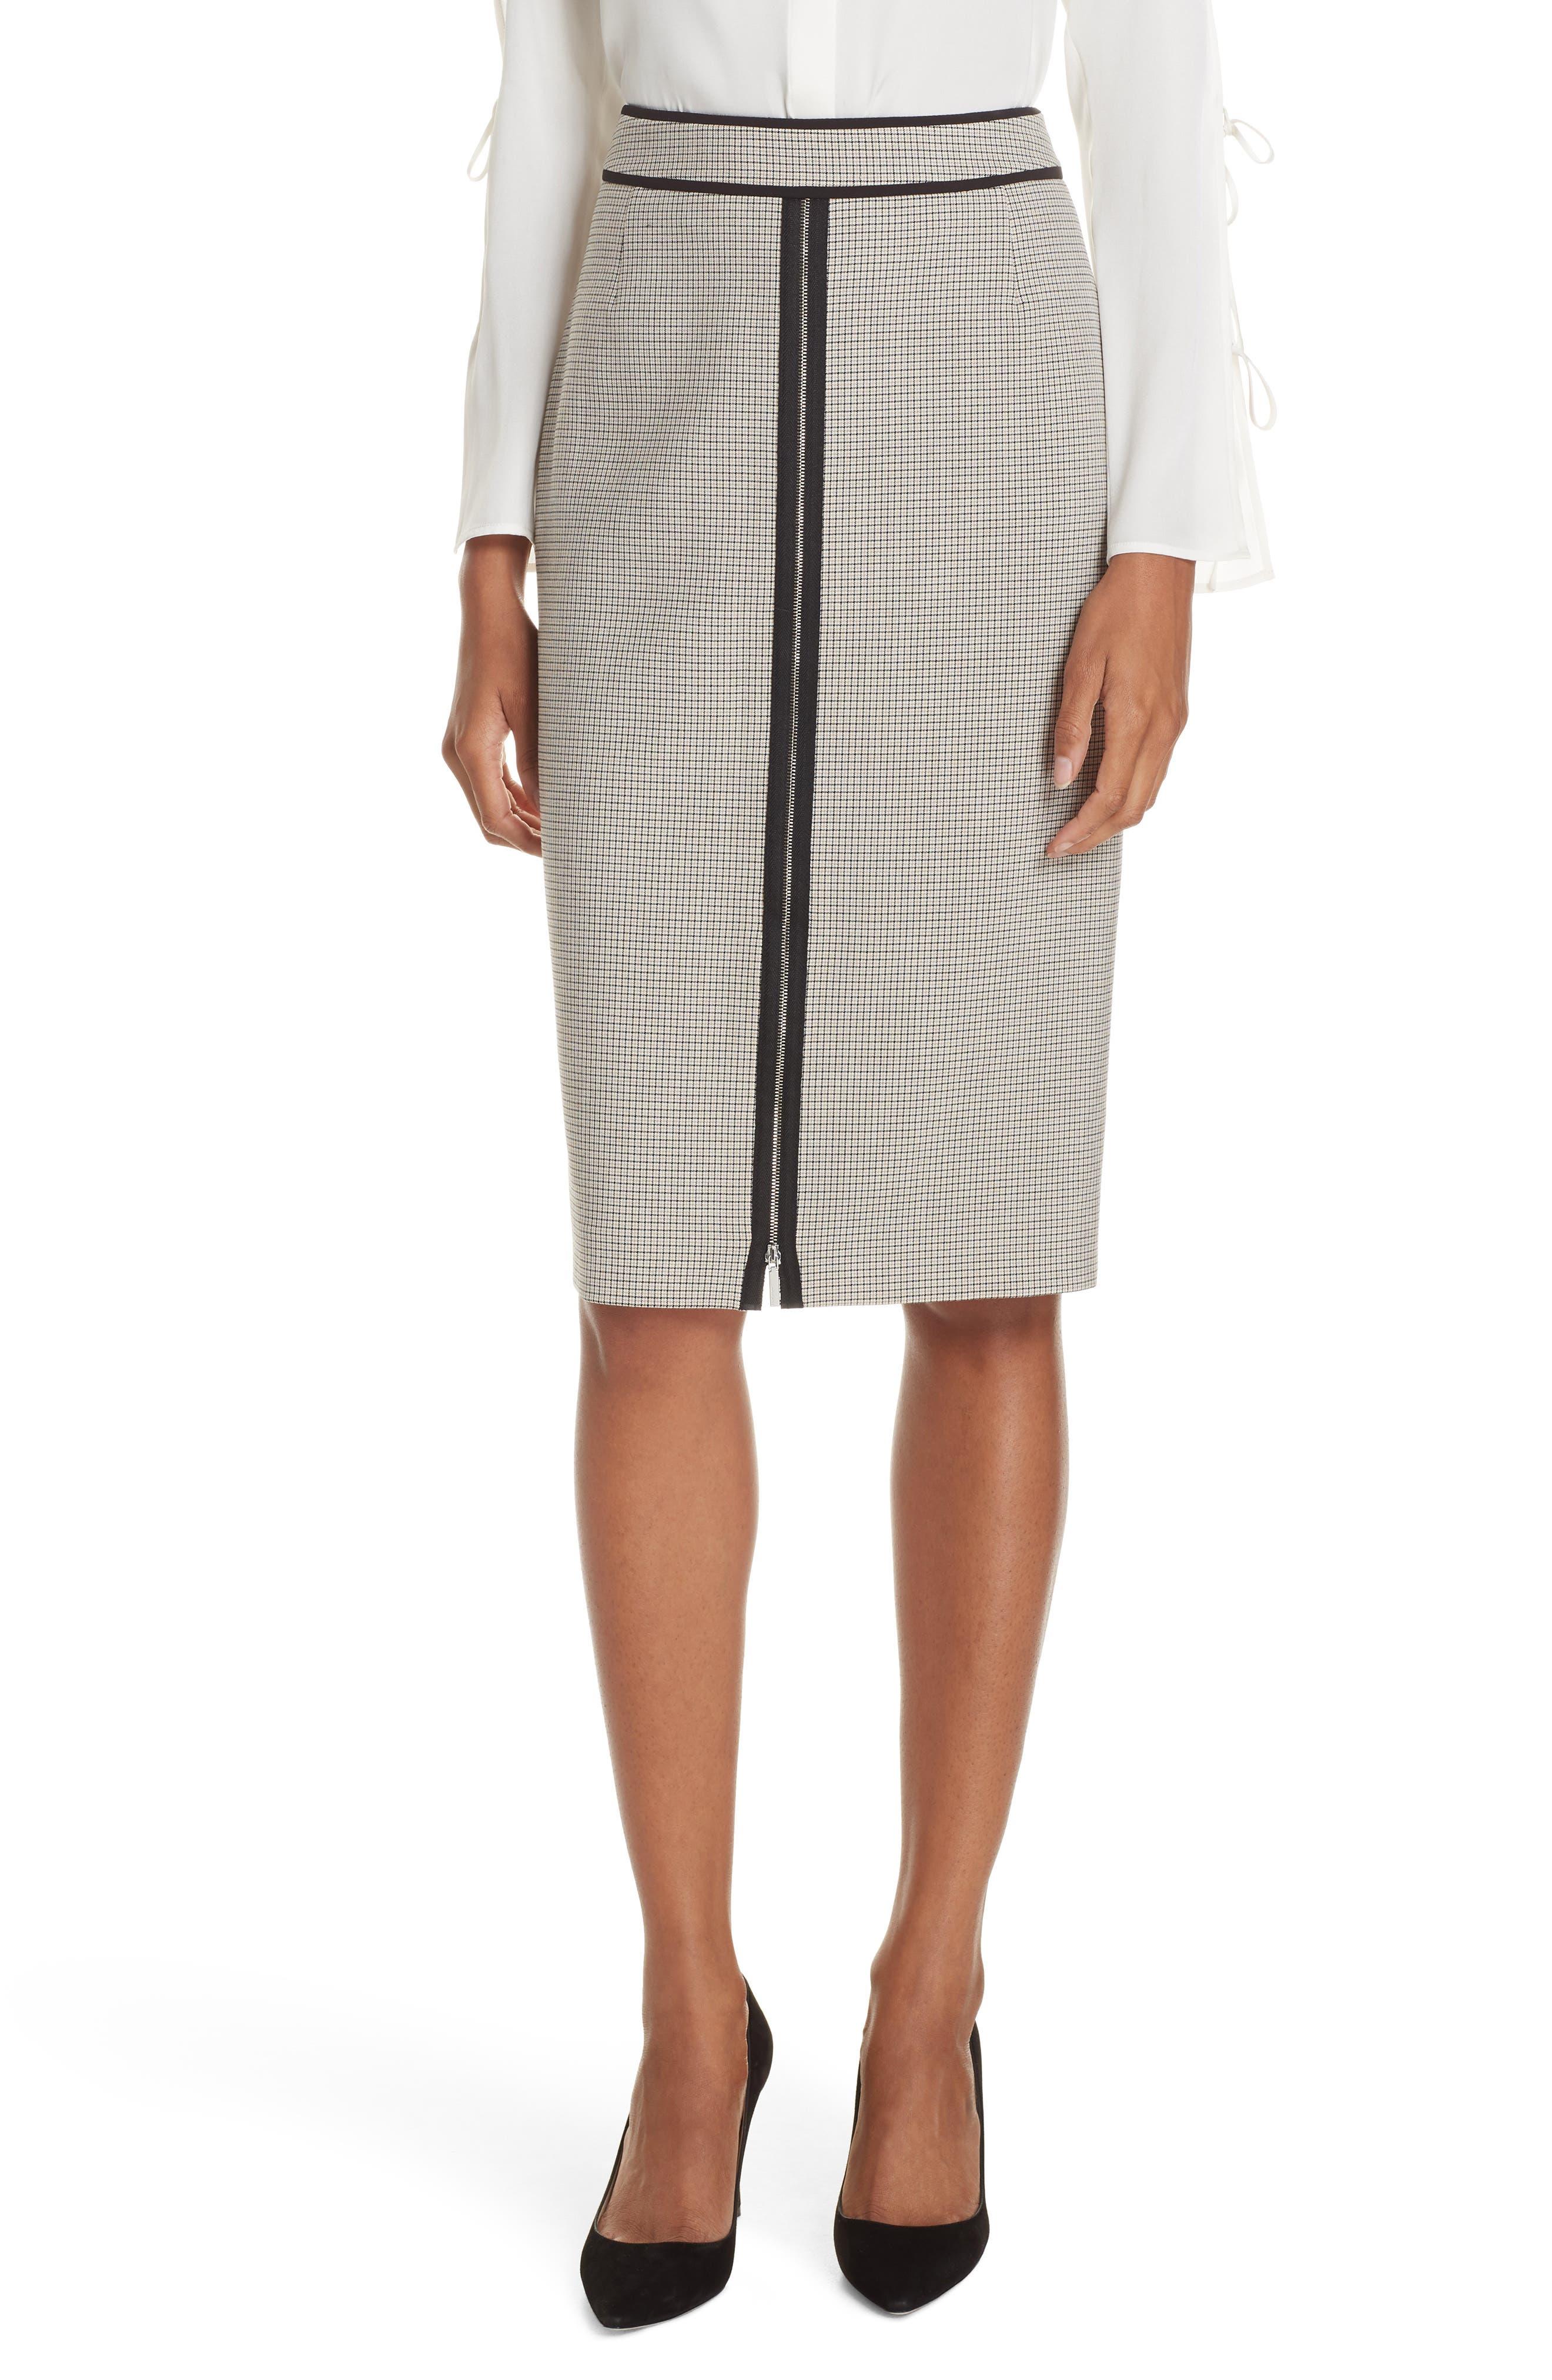 Voliviena Pencil Skirt,                         Main,                         color, STONE FANTASTY